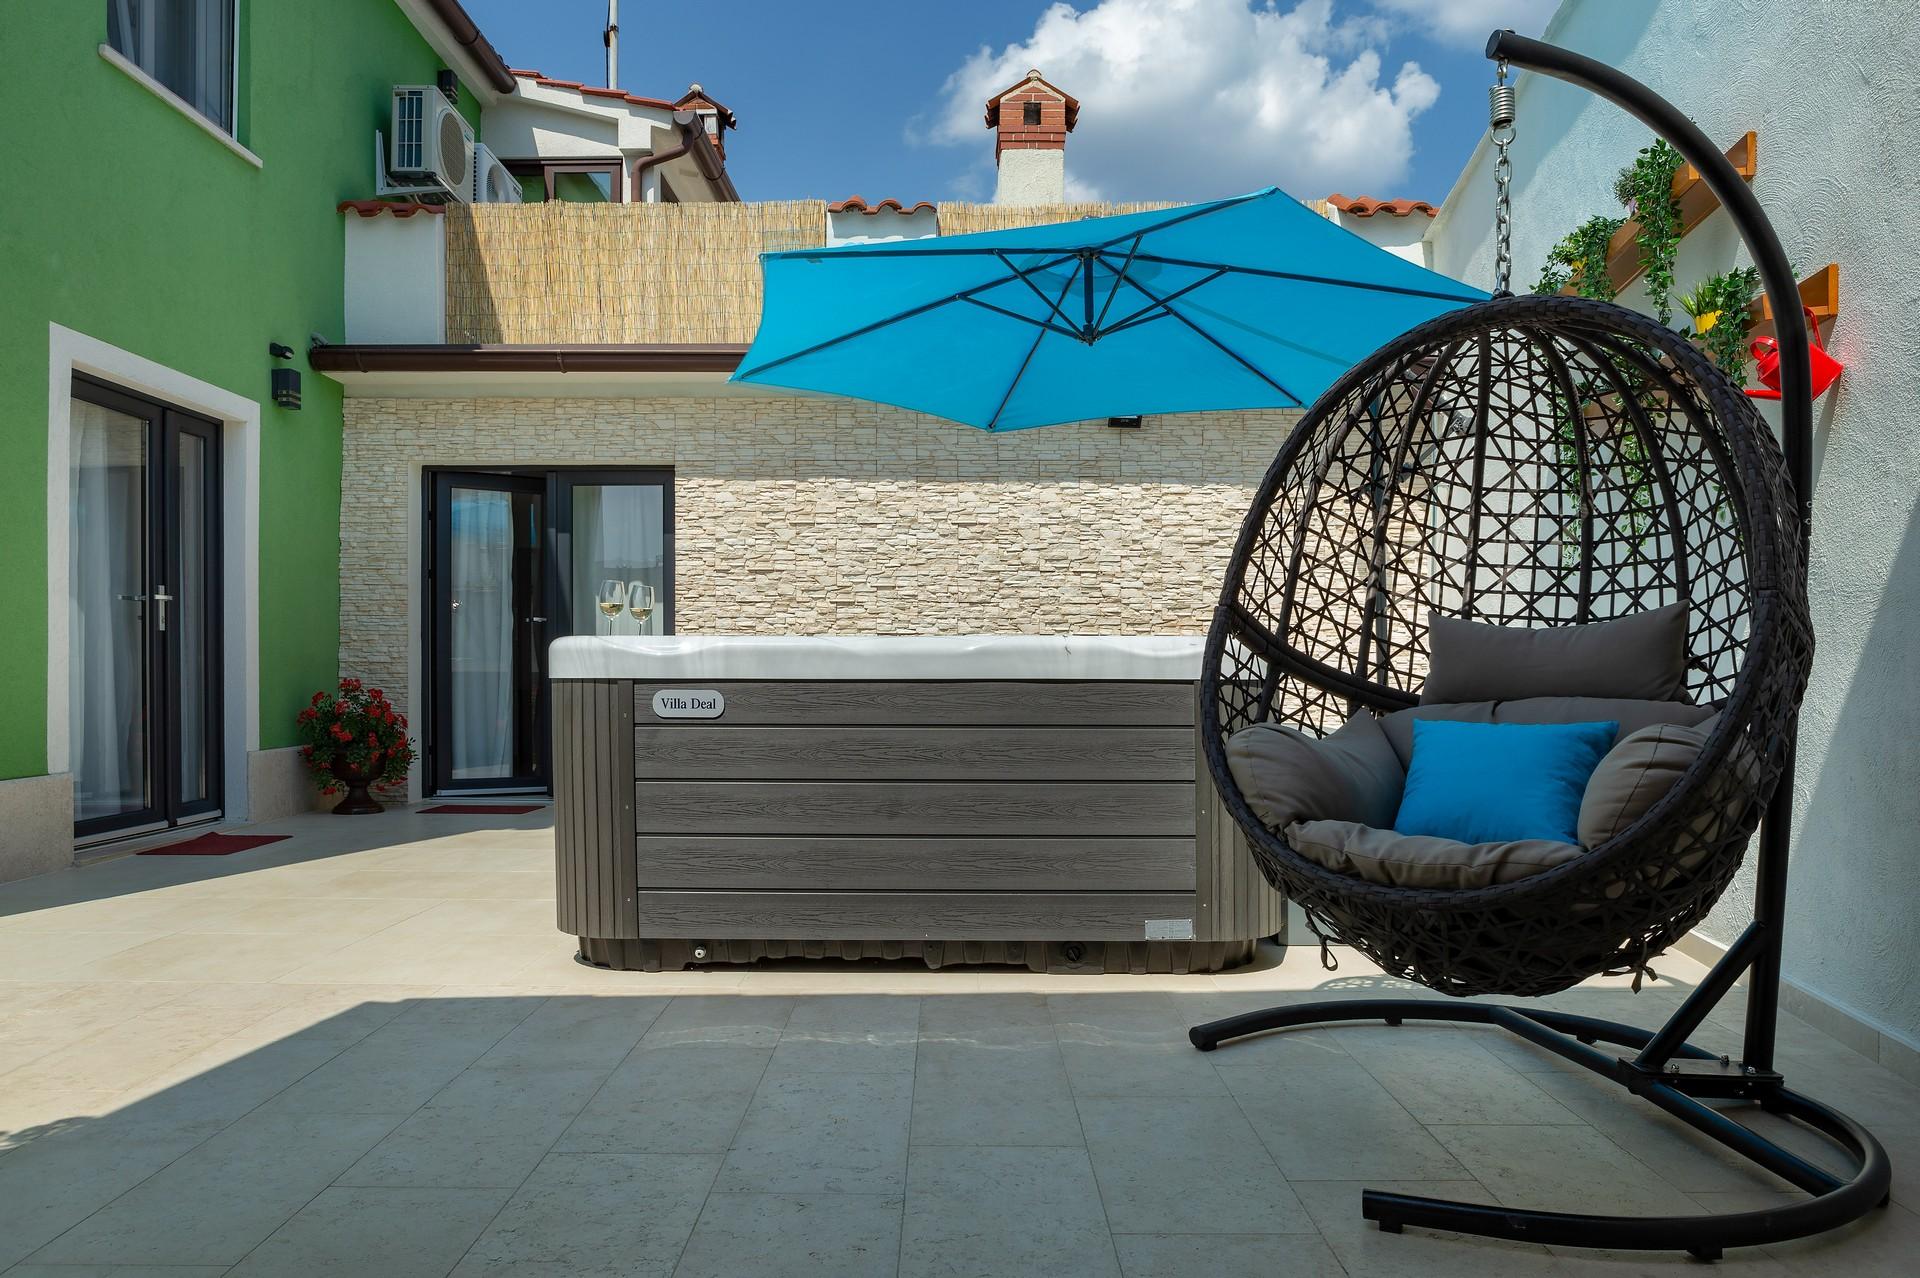 villa deal outdoors (27)